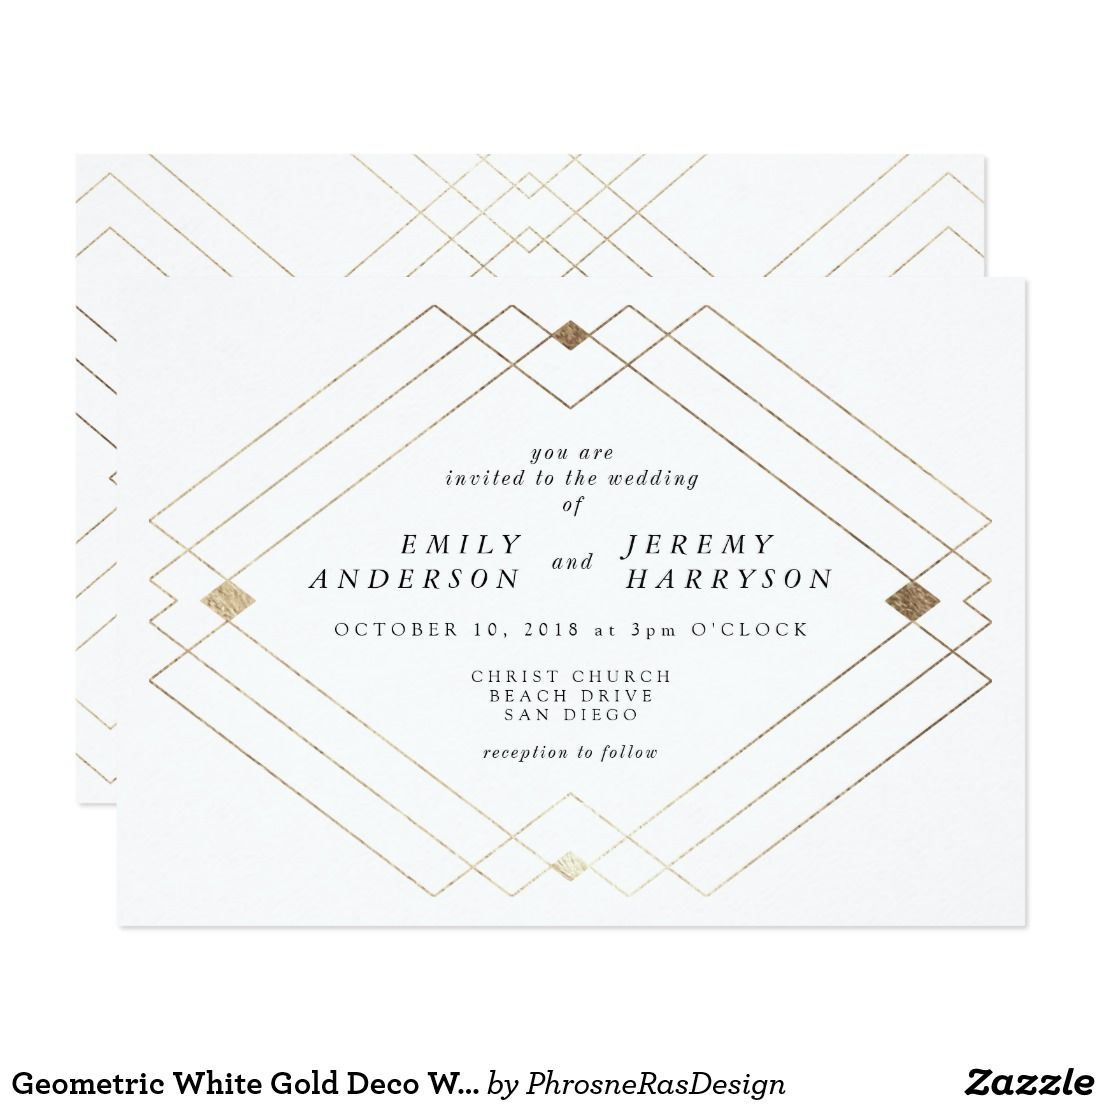 Geometric White Gold Deco White Wedding Invitation